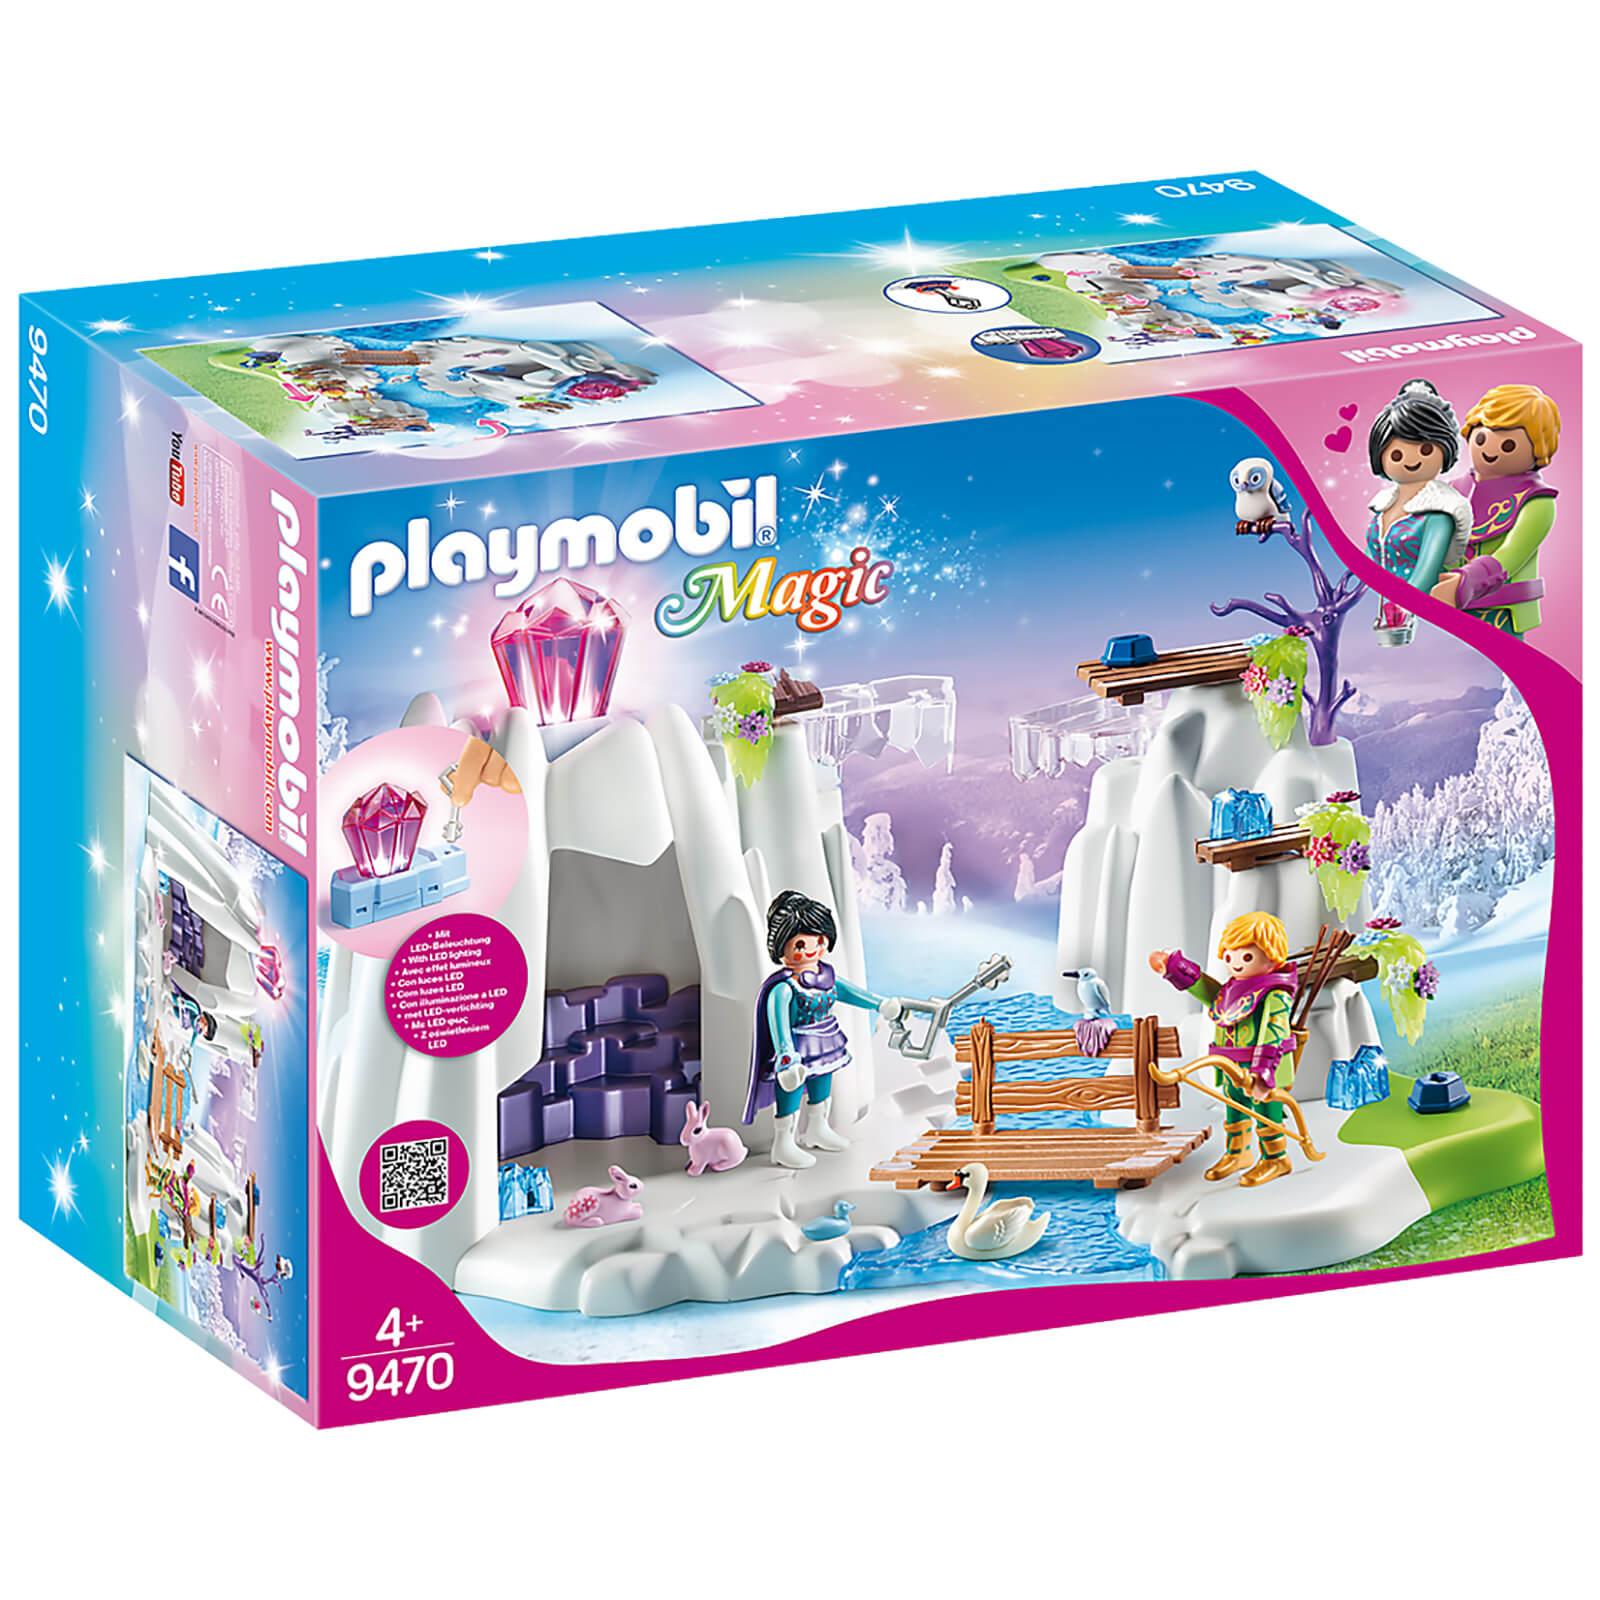 Playmobil Magic Crystal Diamond Hideout with Shiny Crystal (9470)